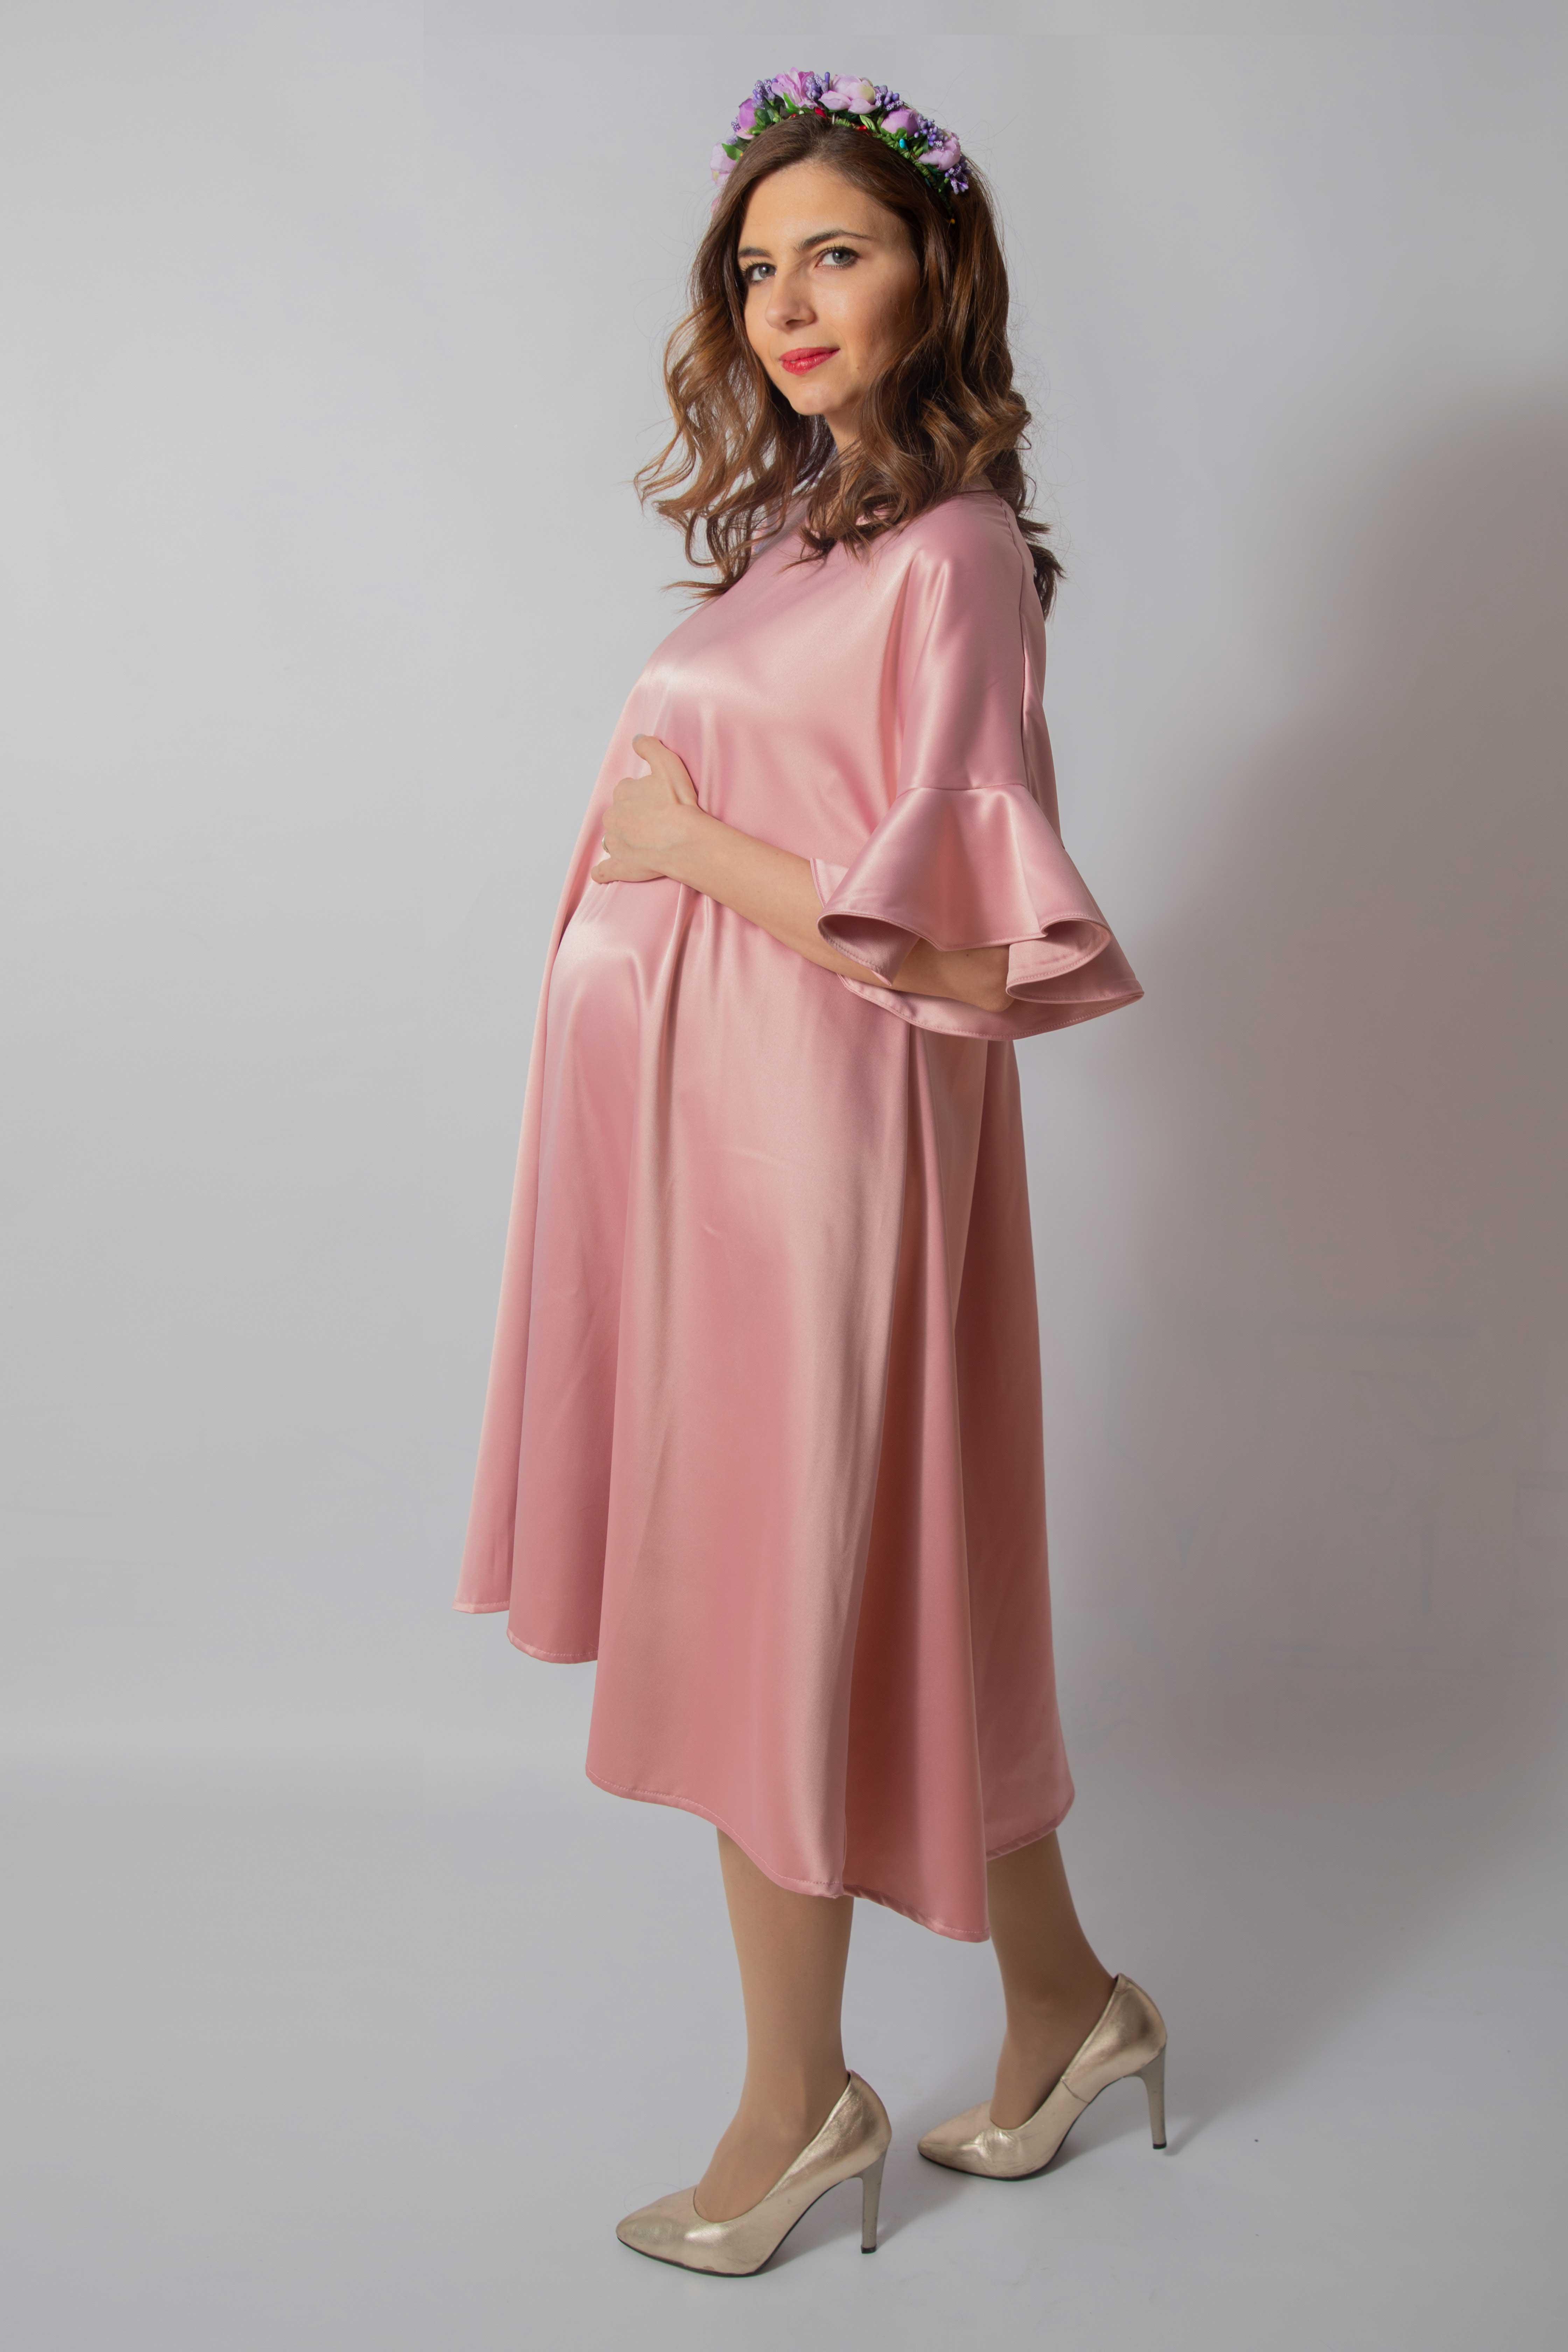 champagne-blush-rochie-super-eleganta-gravida-produsa-in-romania 1